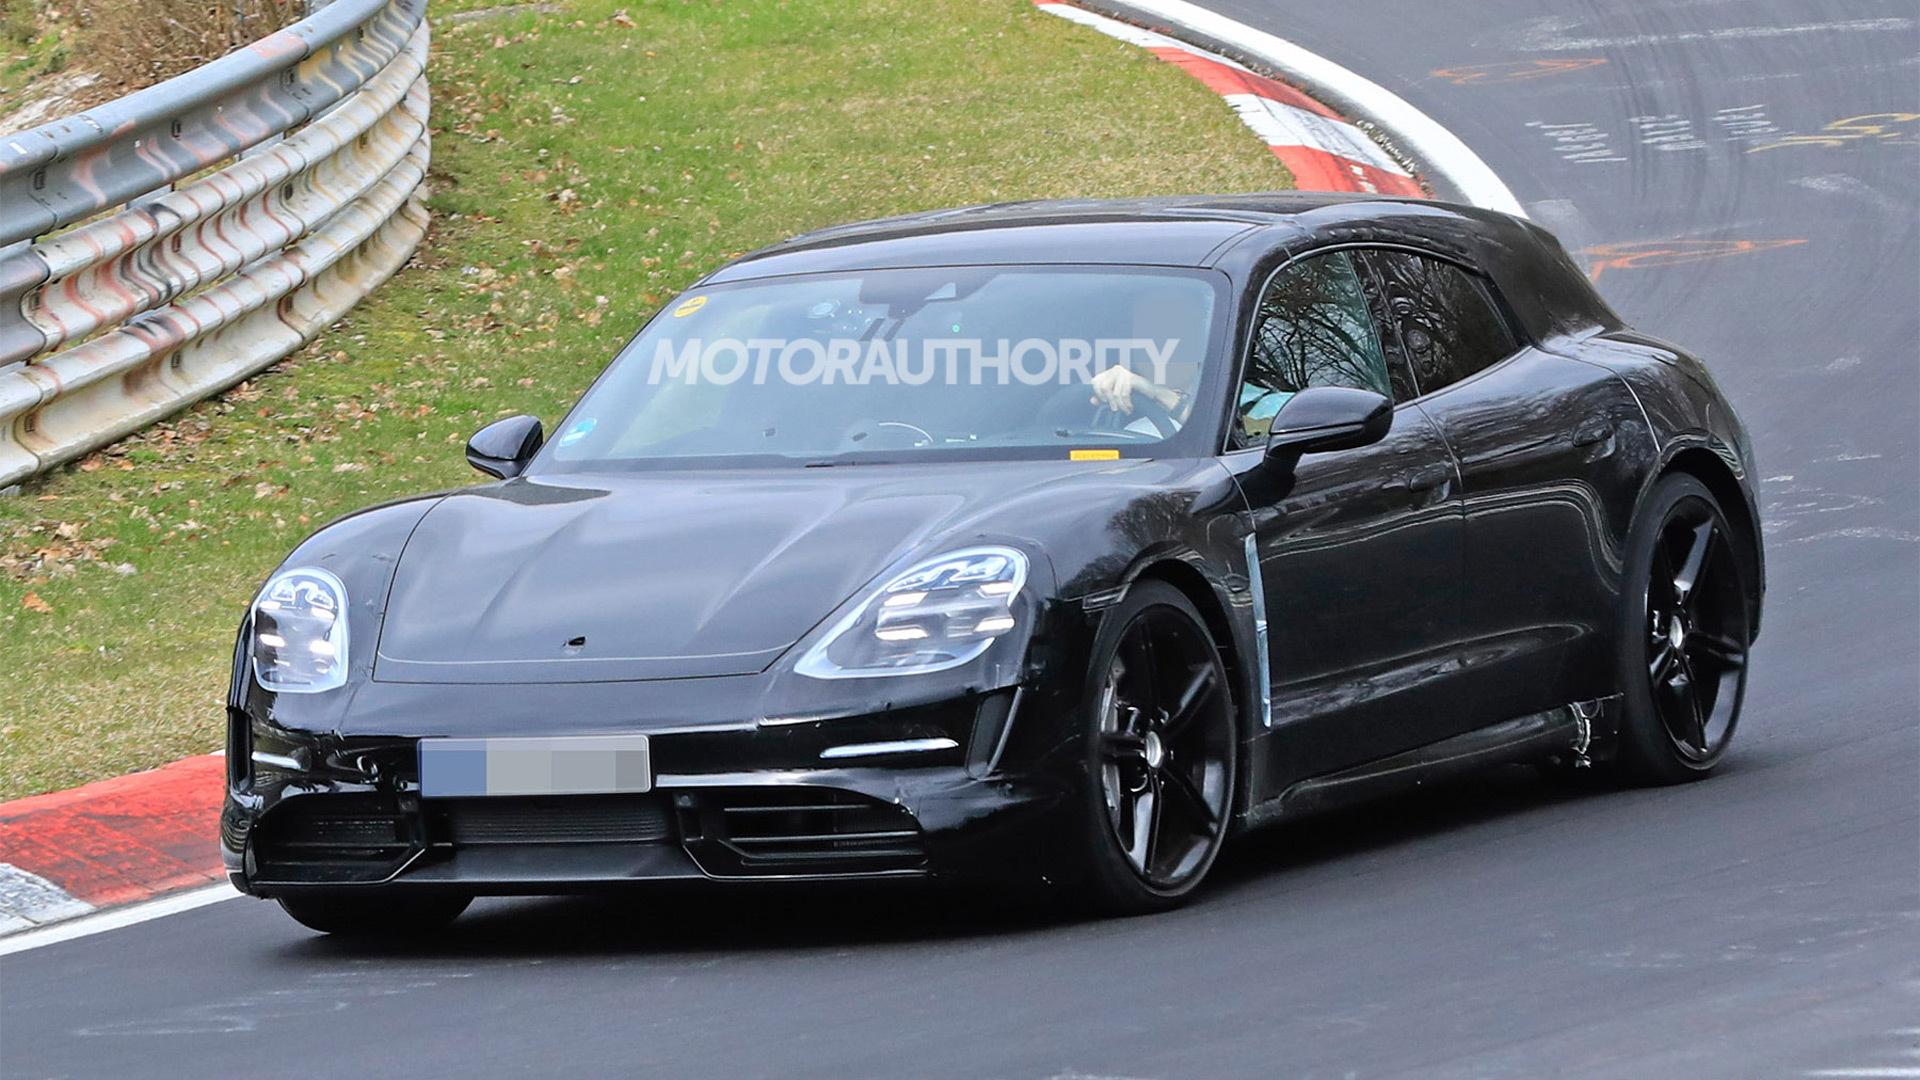 2021 Porsche Taycan Cross Turismo spy shots - Image via S. Baldauf/SB-Medien